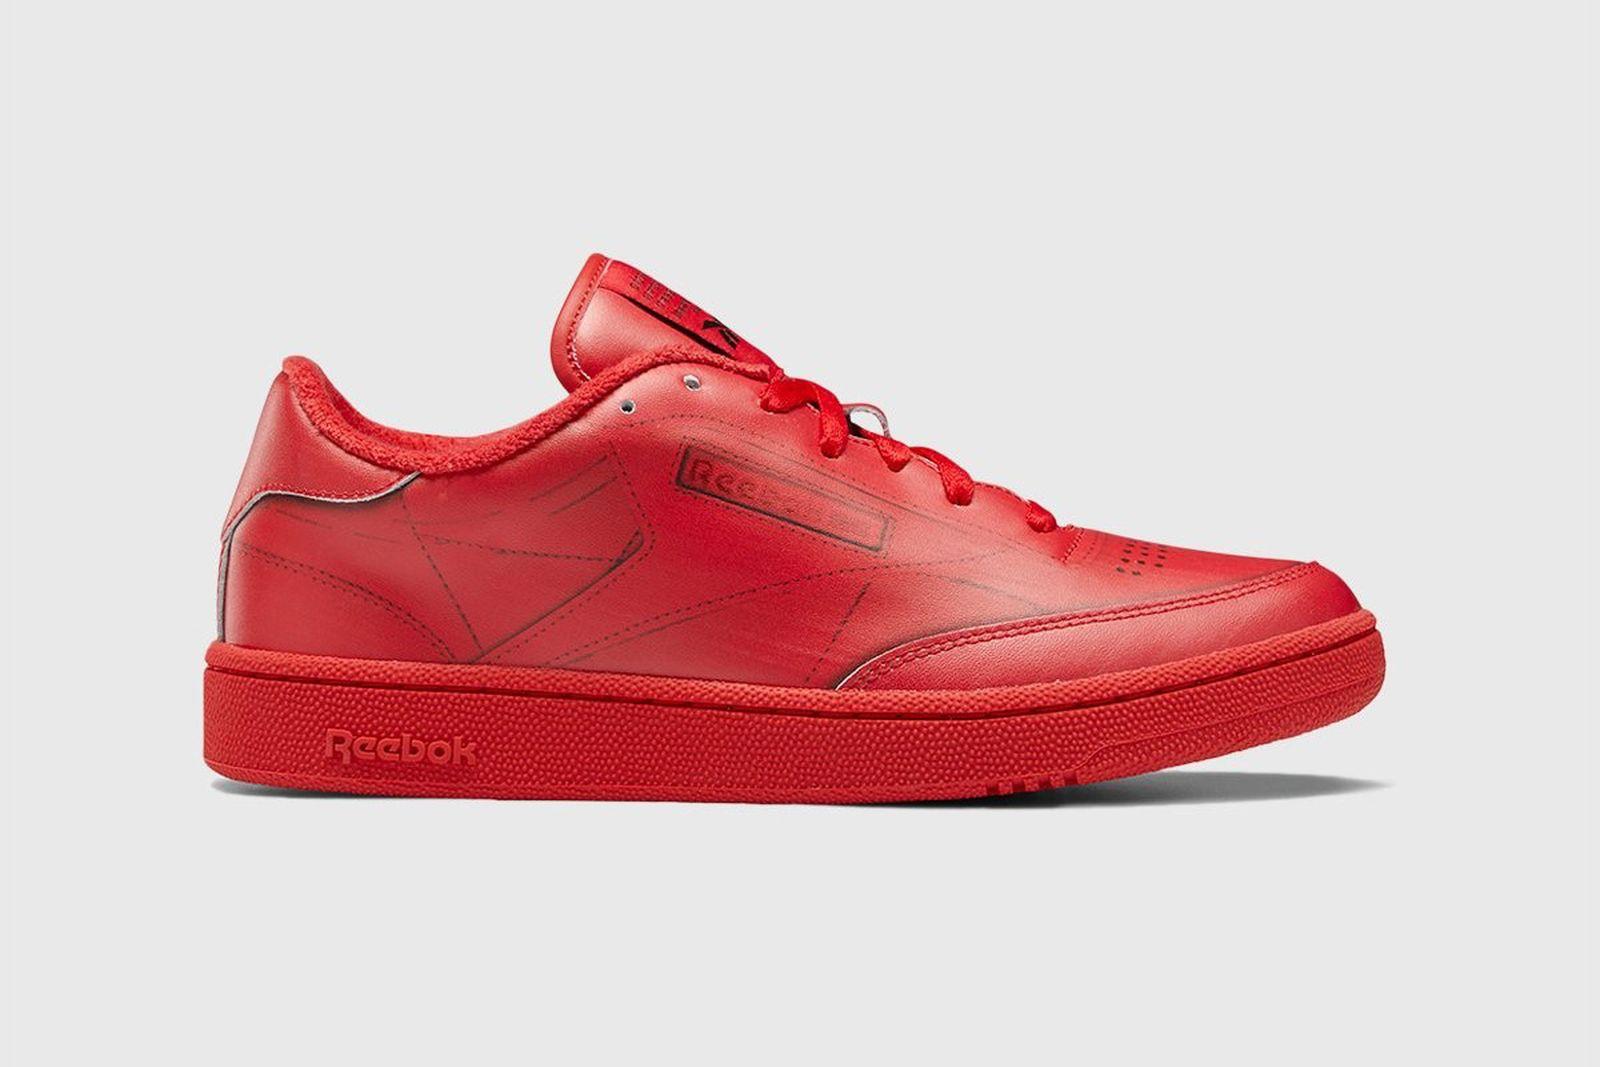 maison-margiela-reebok-classic-leather-tabi-red-grey-release-date-price-09